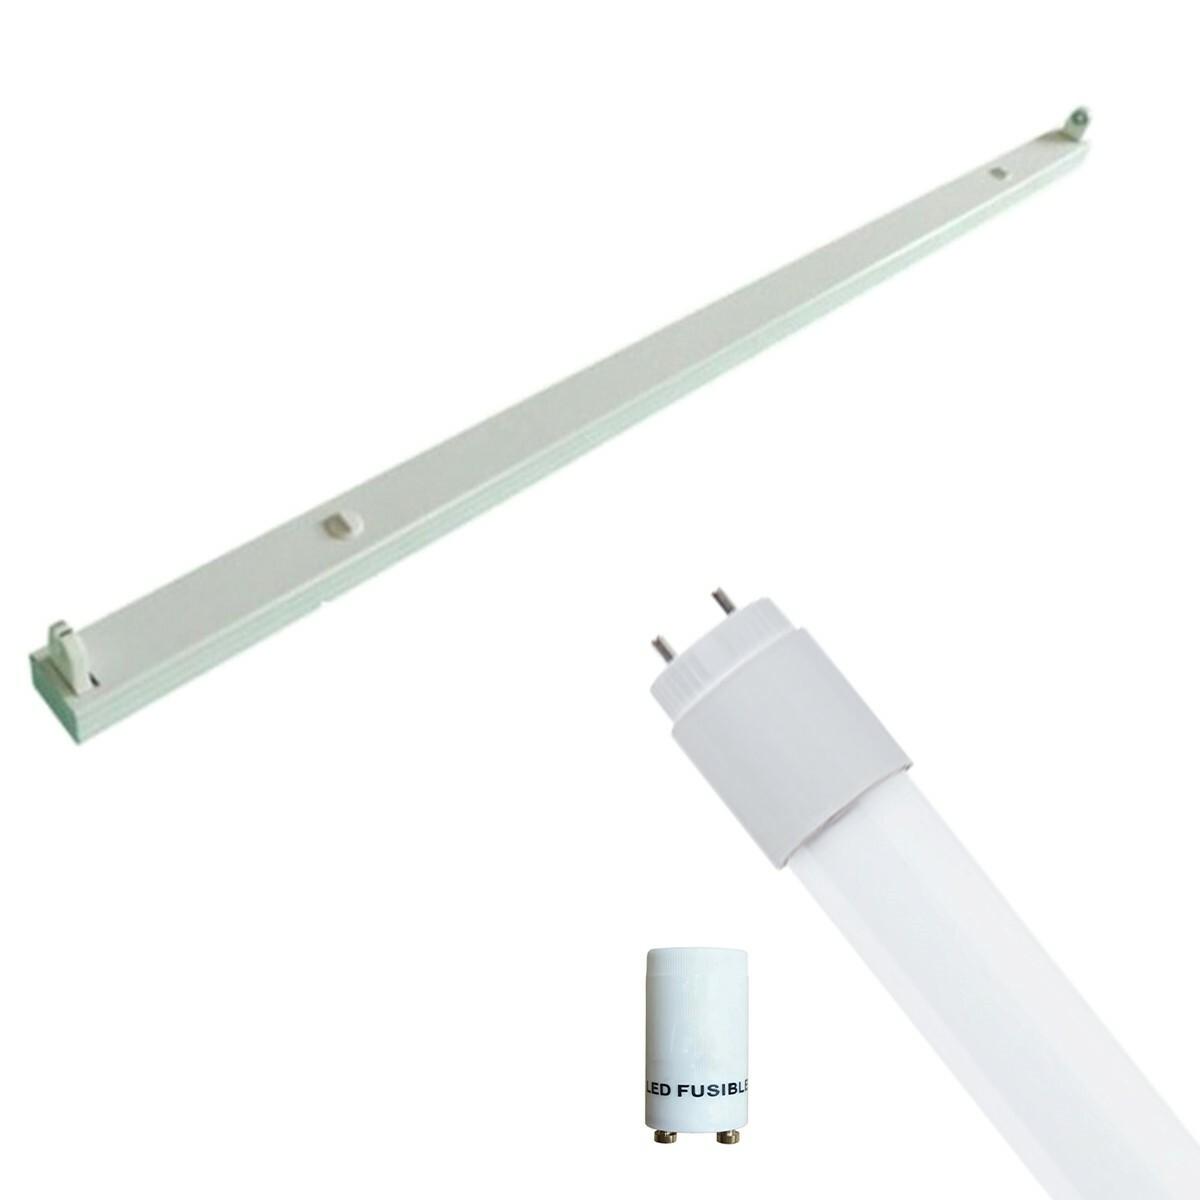 LED TL Armatuur met T8 Buis Incl. Starter - Aigi Dybolo - 120cm Enkel - 16W - Helder/Koud Wit 6400K